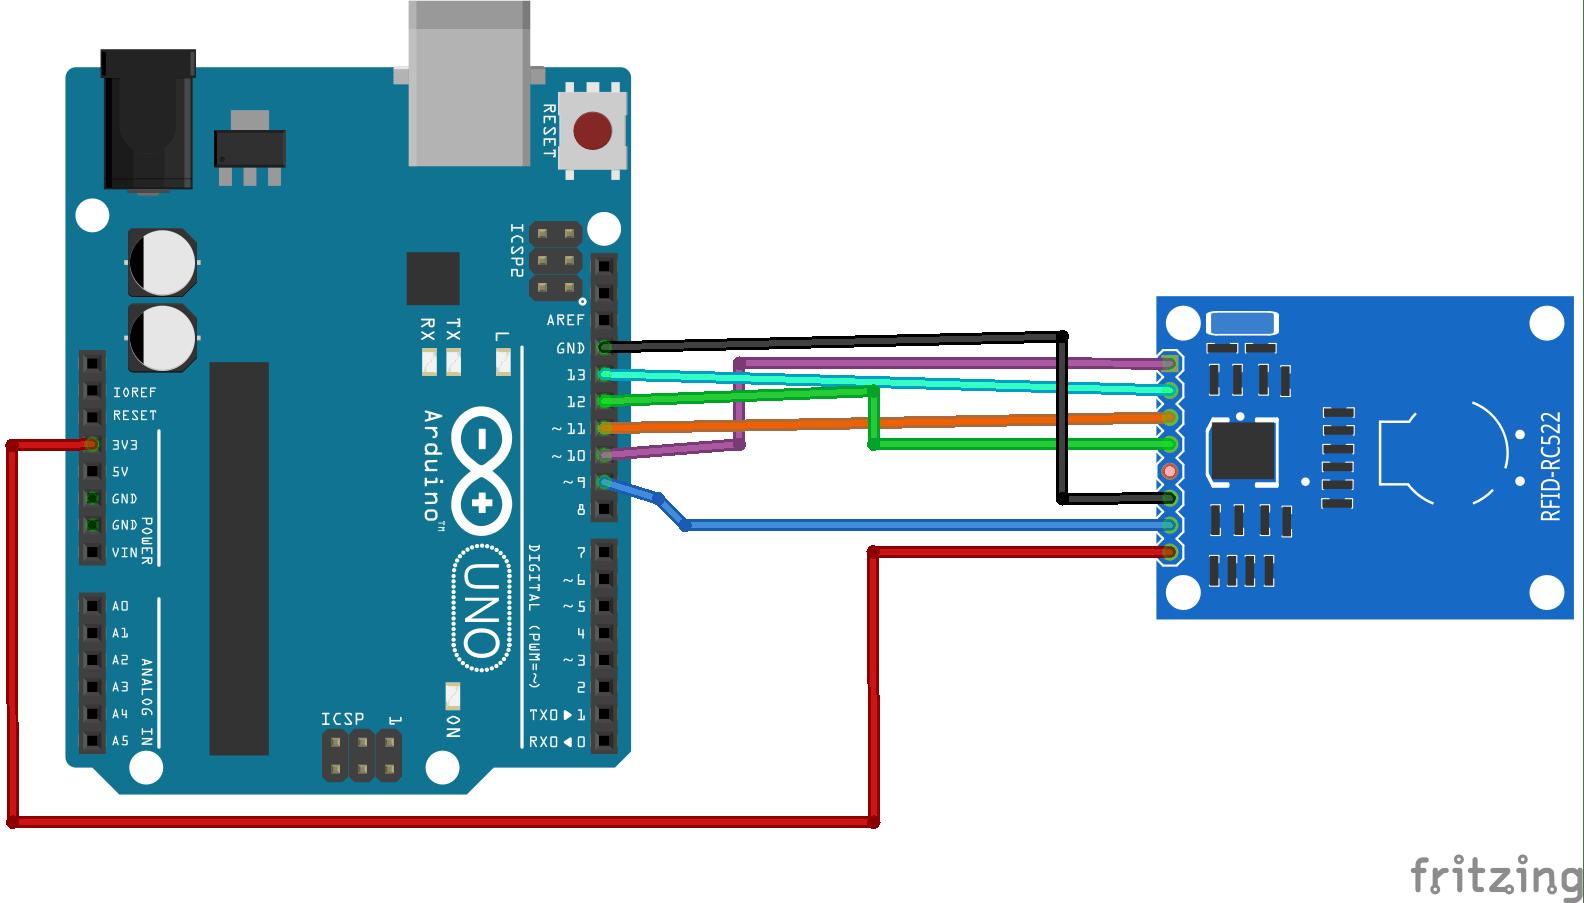 MFRC522 RFID Reader with Arduino Tutorial | Random Nerd ... on parallax rfid, mobile rfid, connected car rfid, nfc vs rfid, diy rfid,